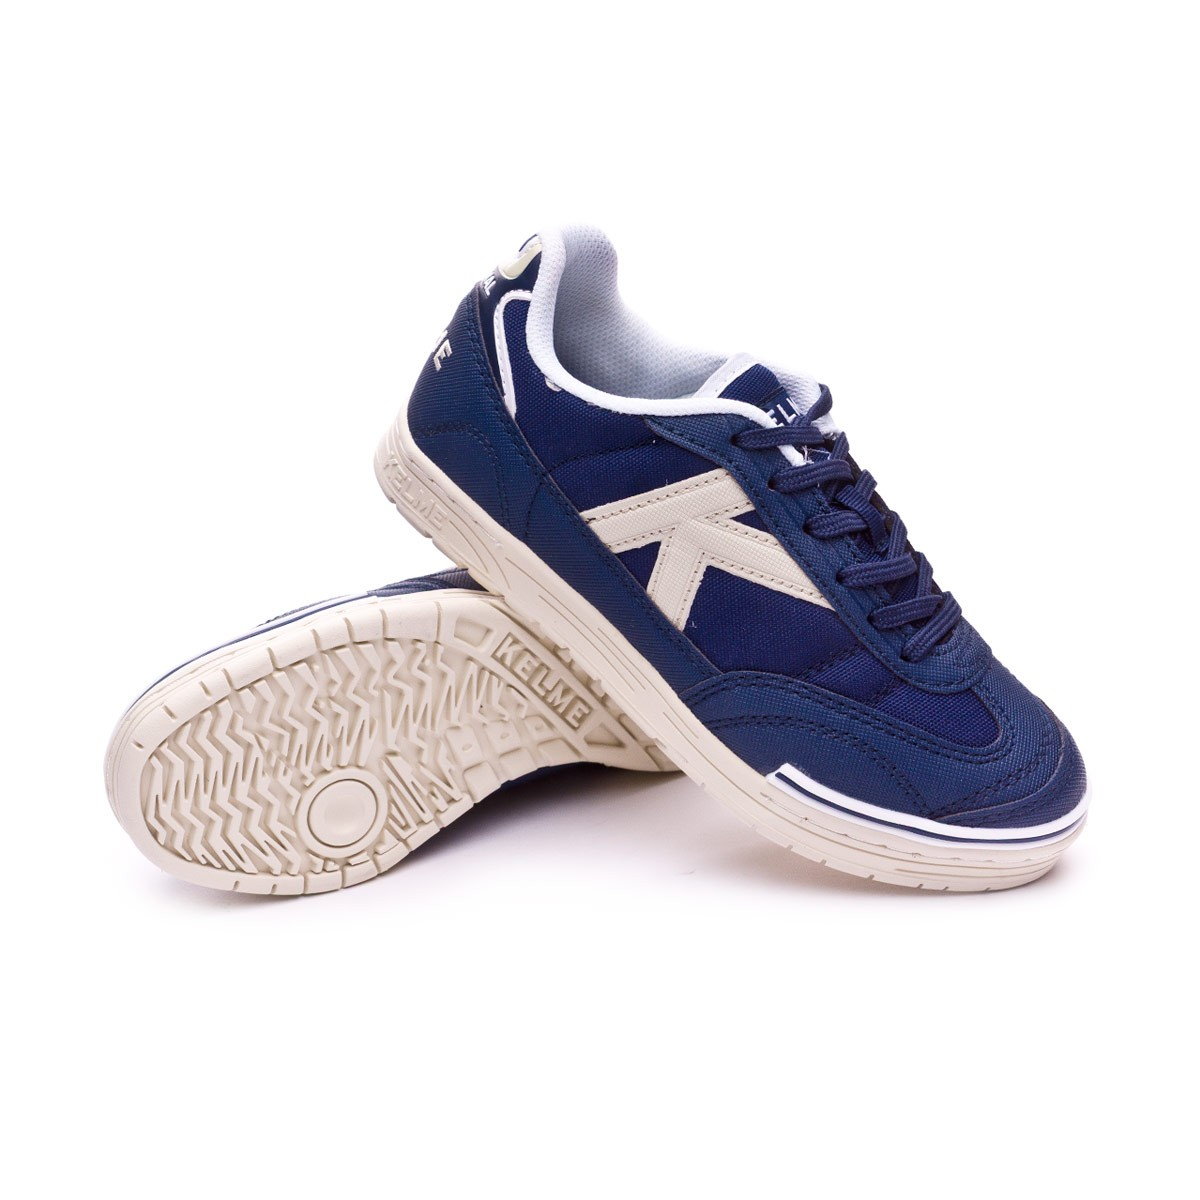 f7cb456c8d8 Futsal Boot Kelme Kids Trueno Sala 2.0 Navy blue-White - Football ...